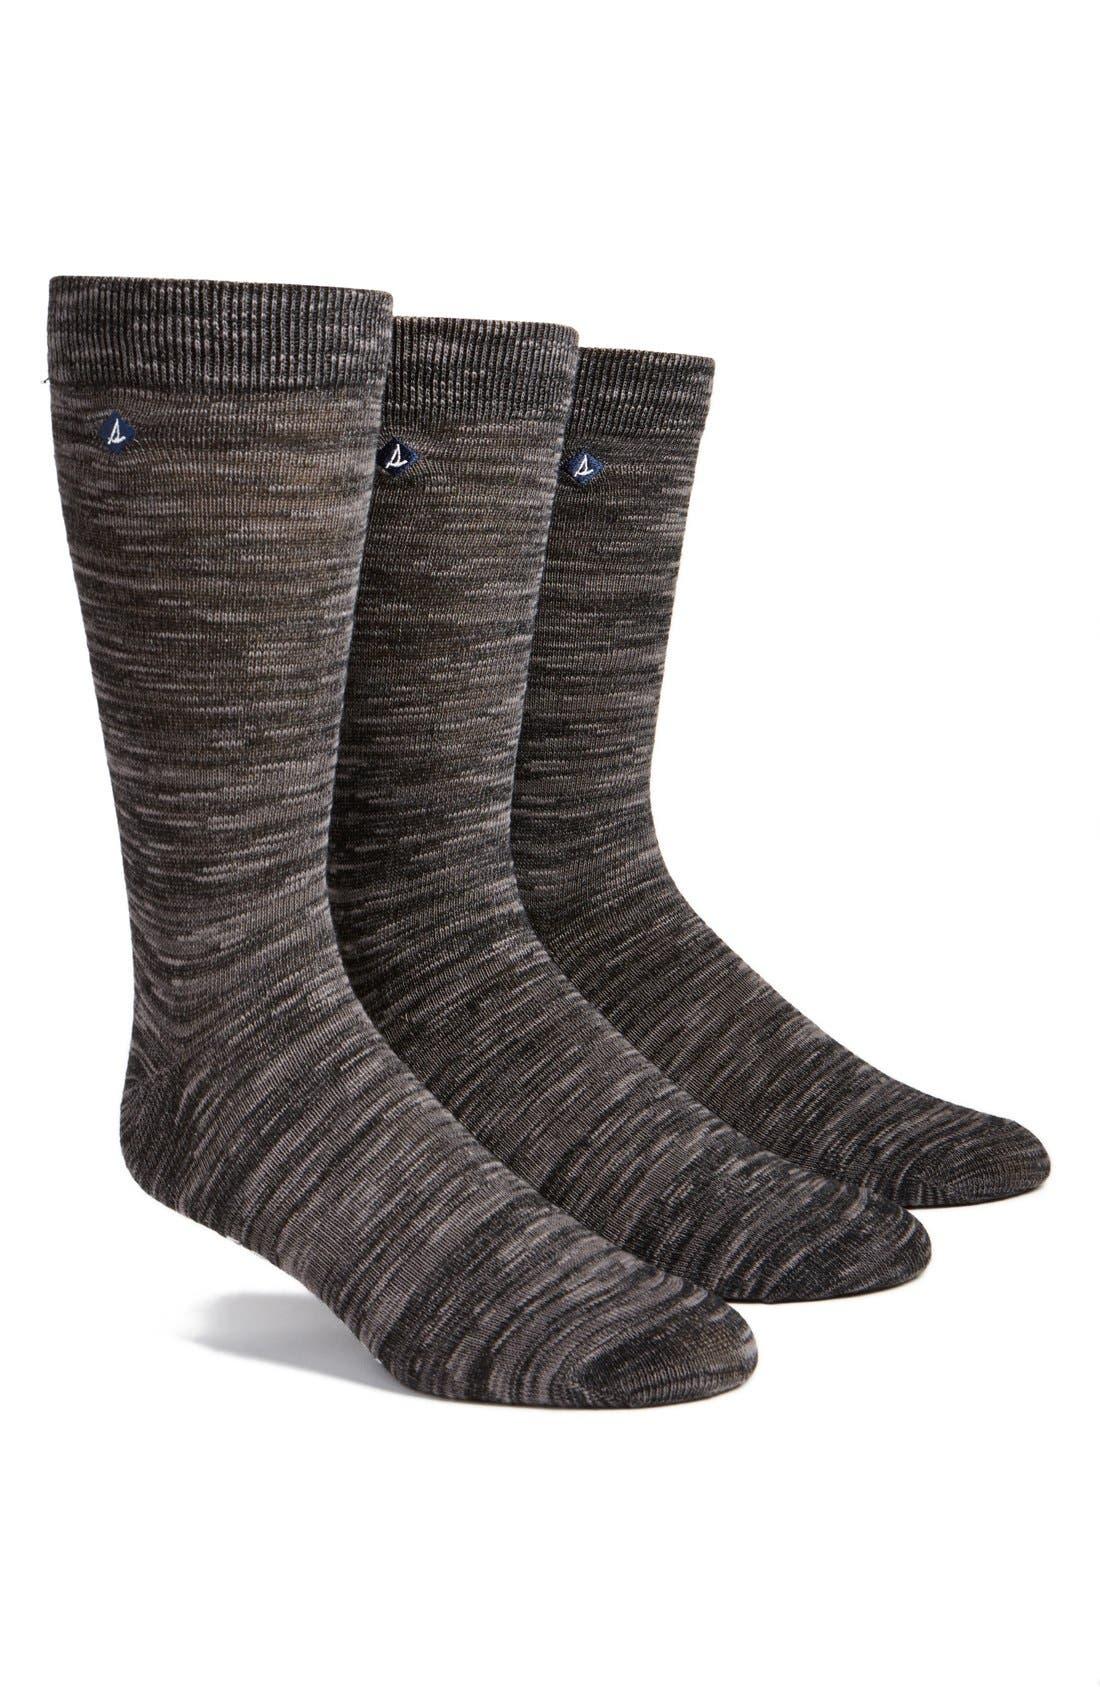 Sperry Cotton Blend Socks (3-Pack)